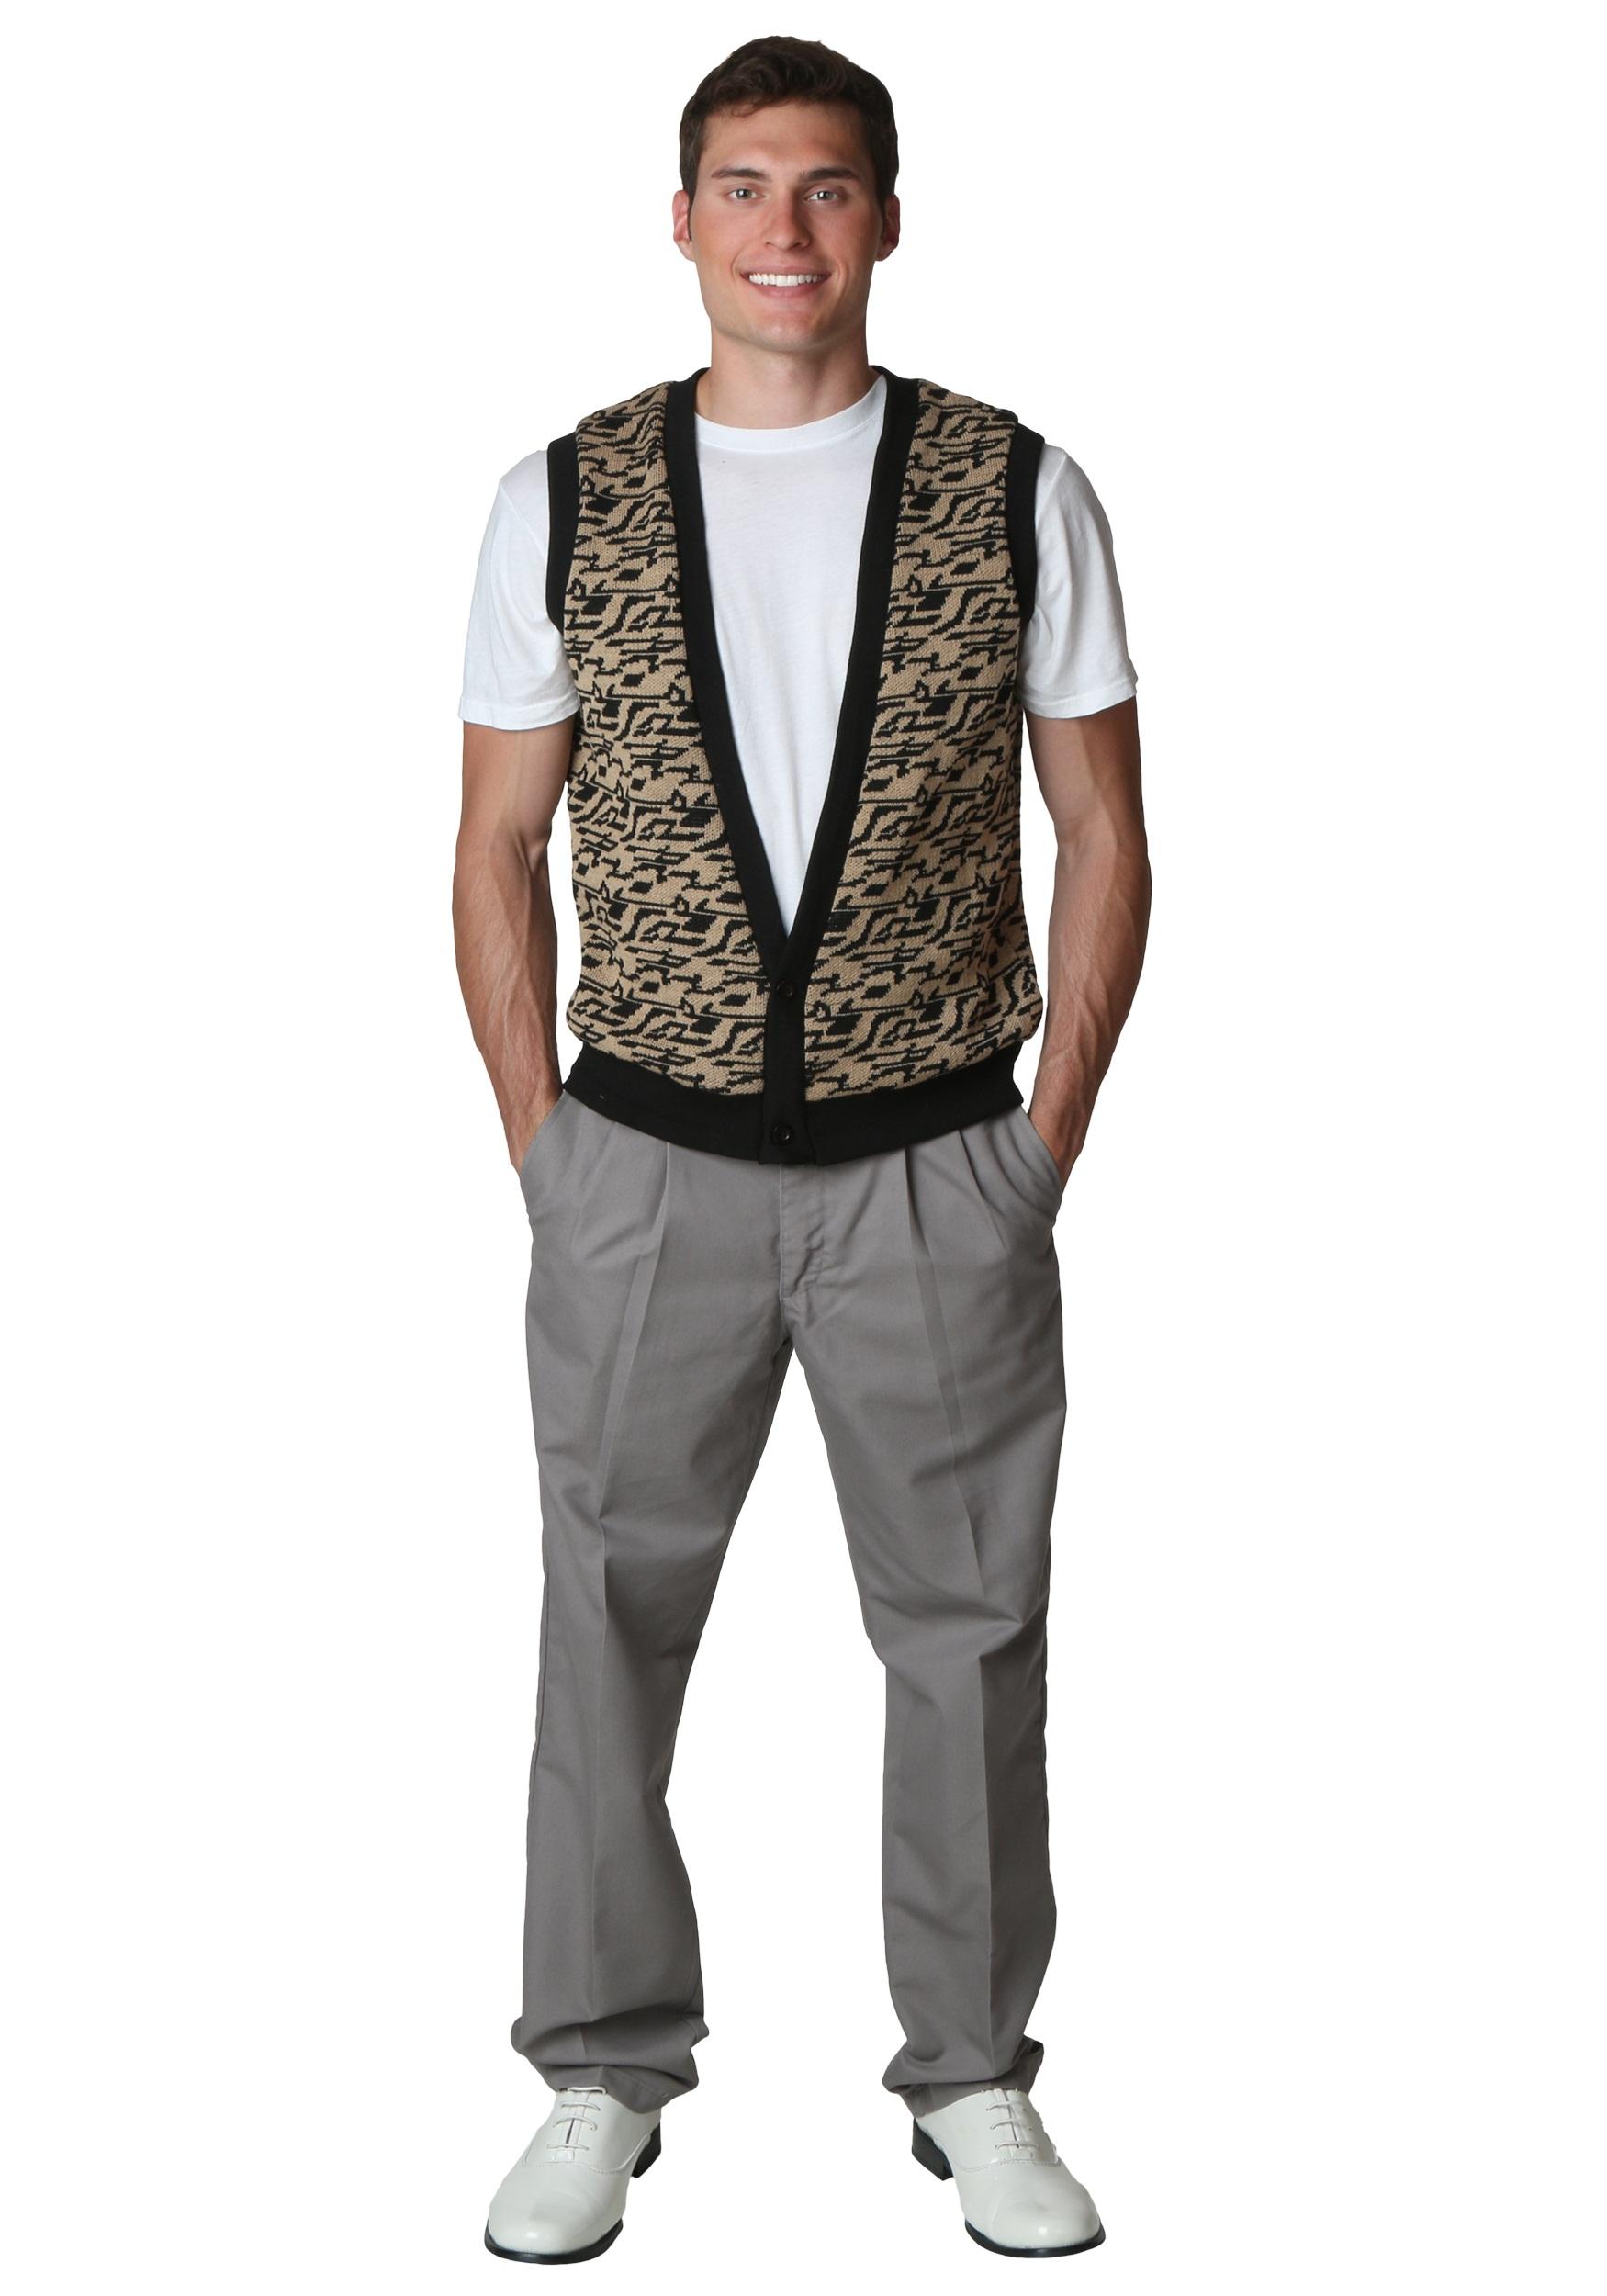 Ferris Bueller Costume alt 2Ferris Bueller Outfit